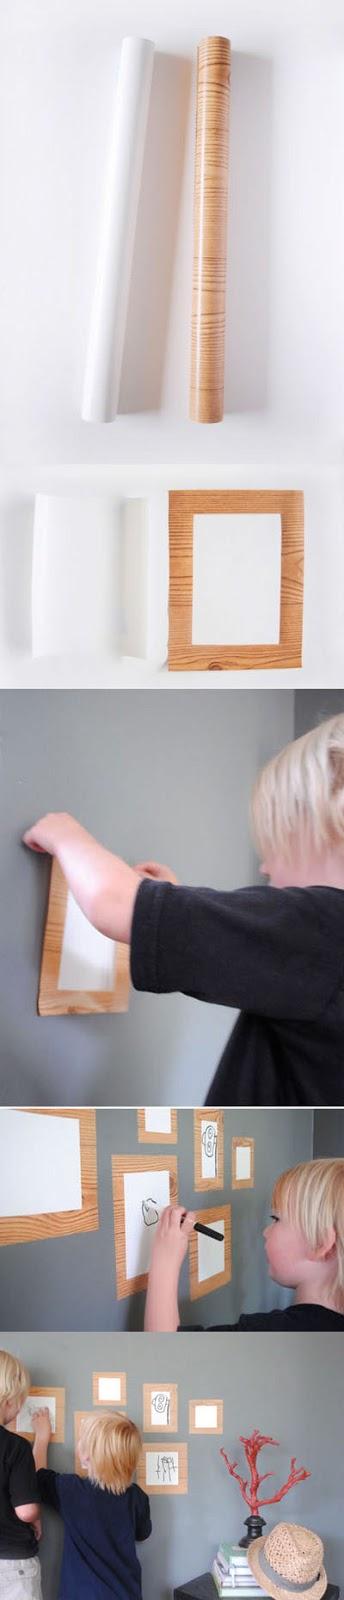 DIY WALL DECOR - Dry erased frame art gallery